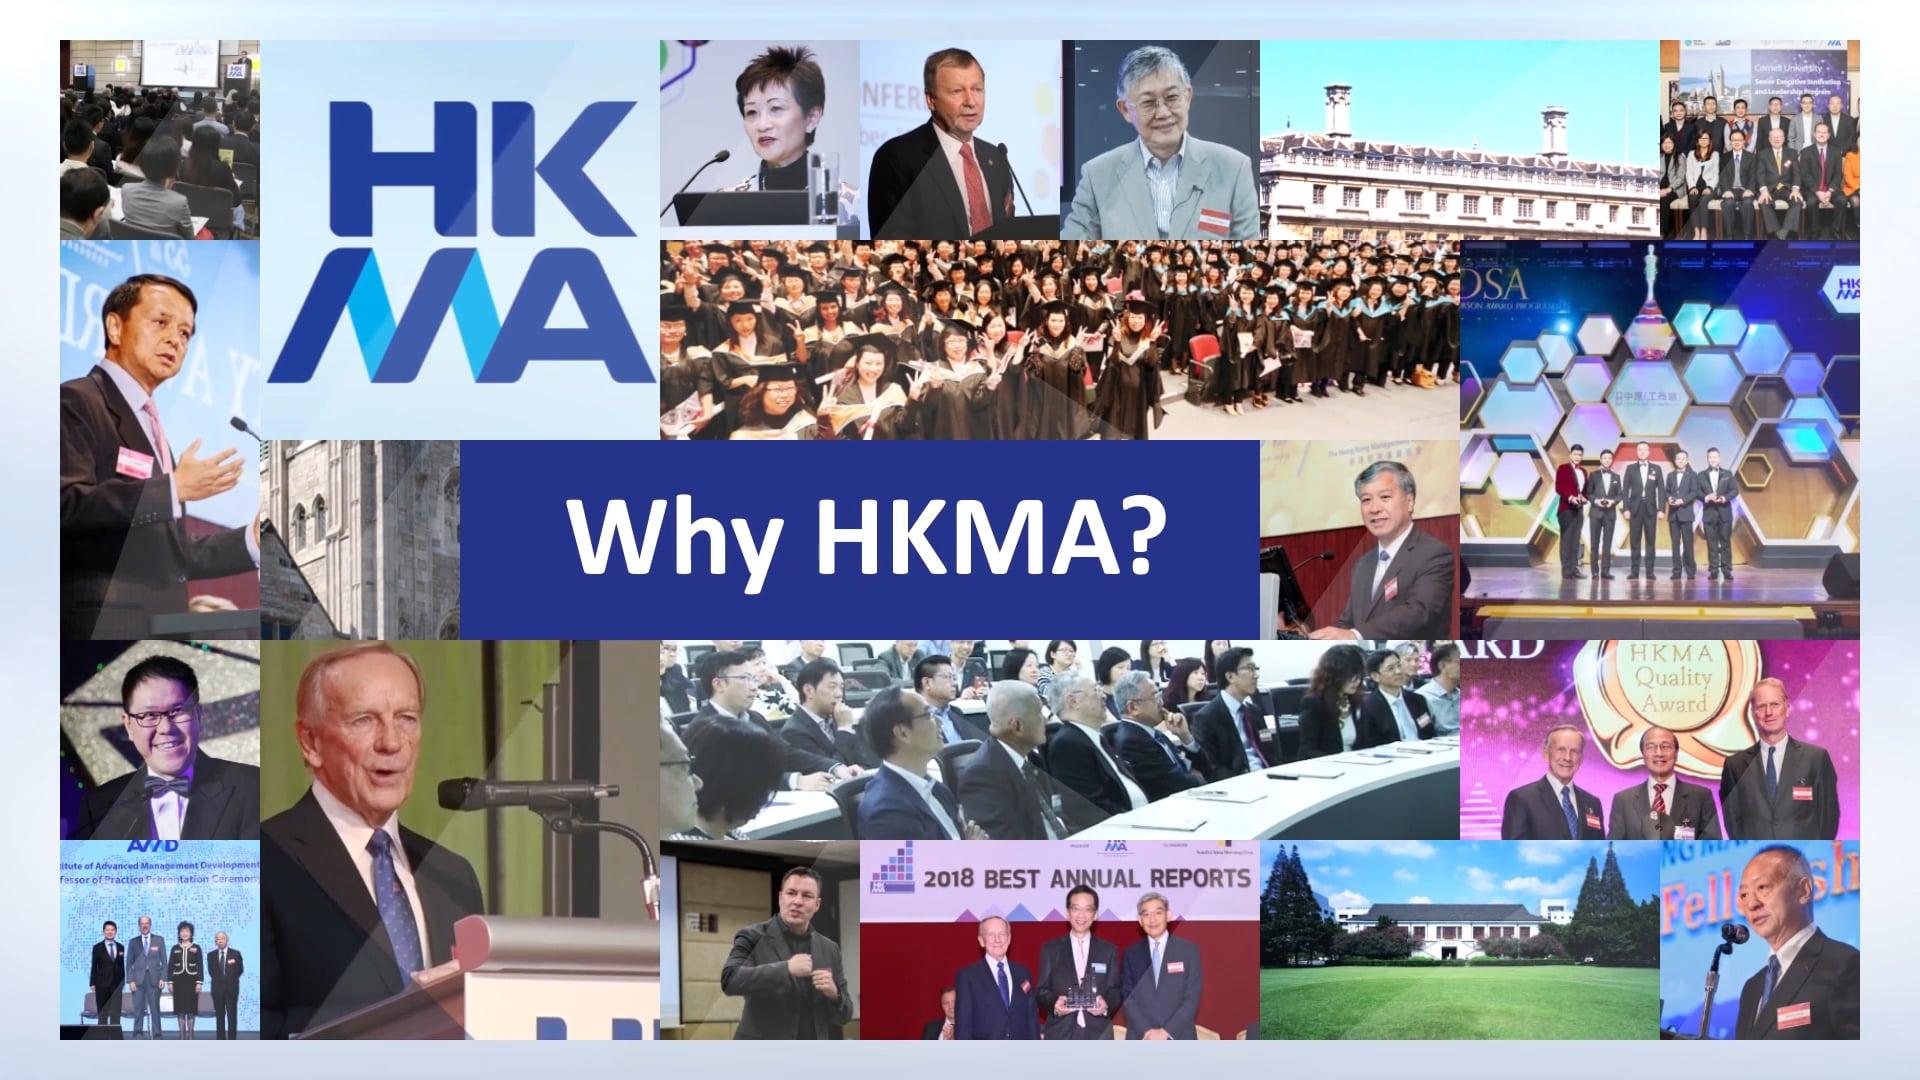 HKMA Corporate Slideshow